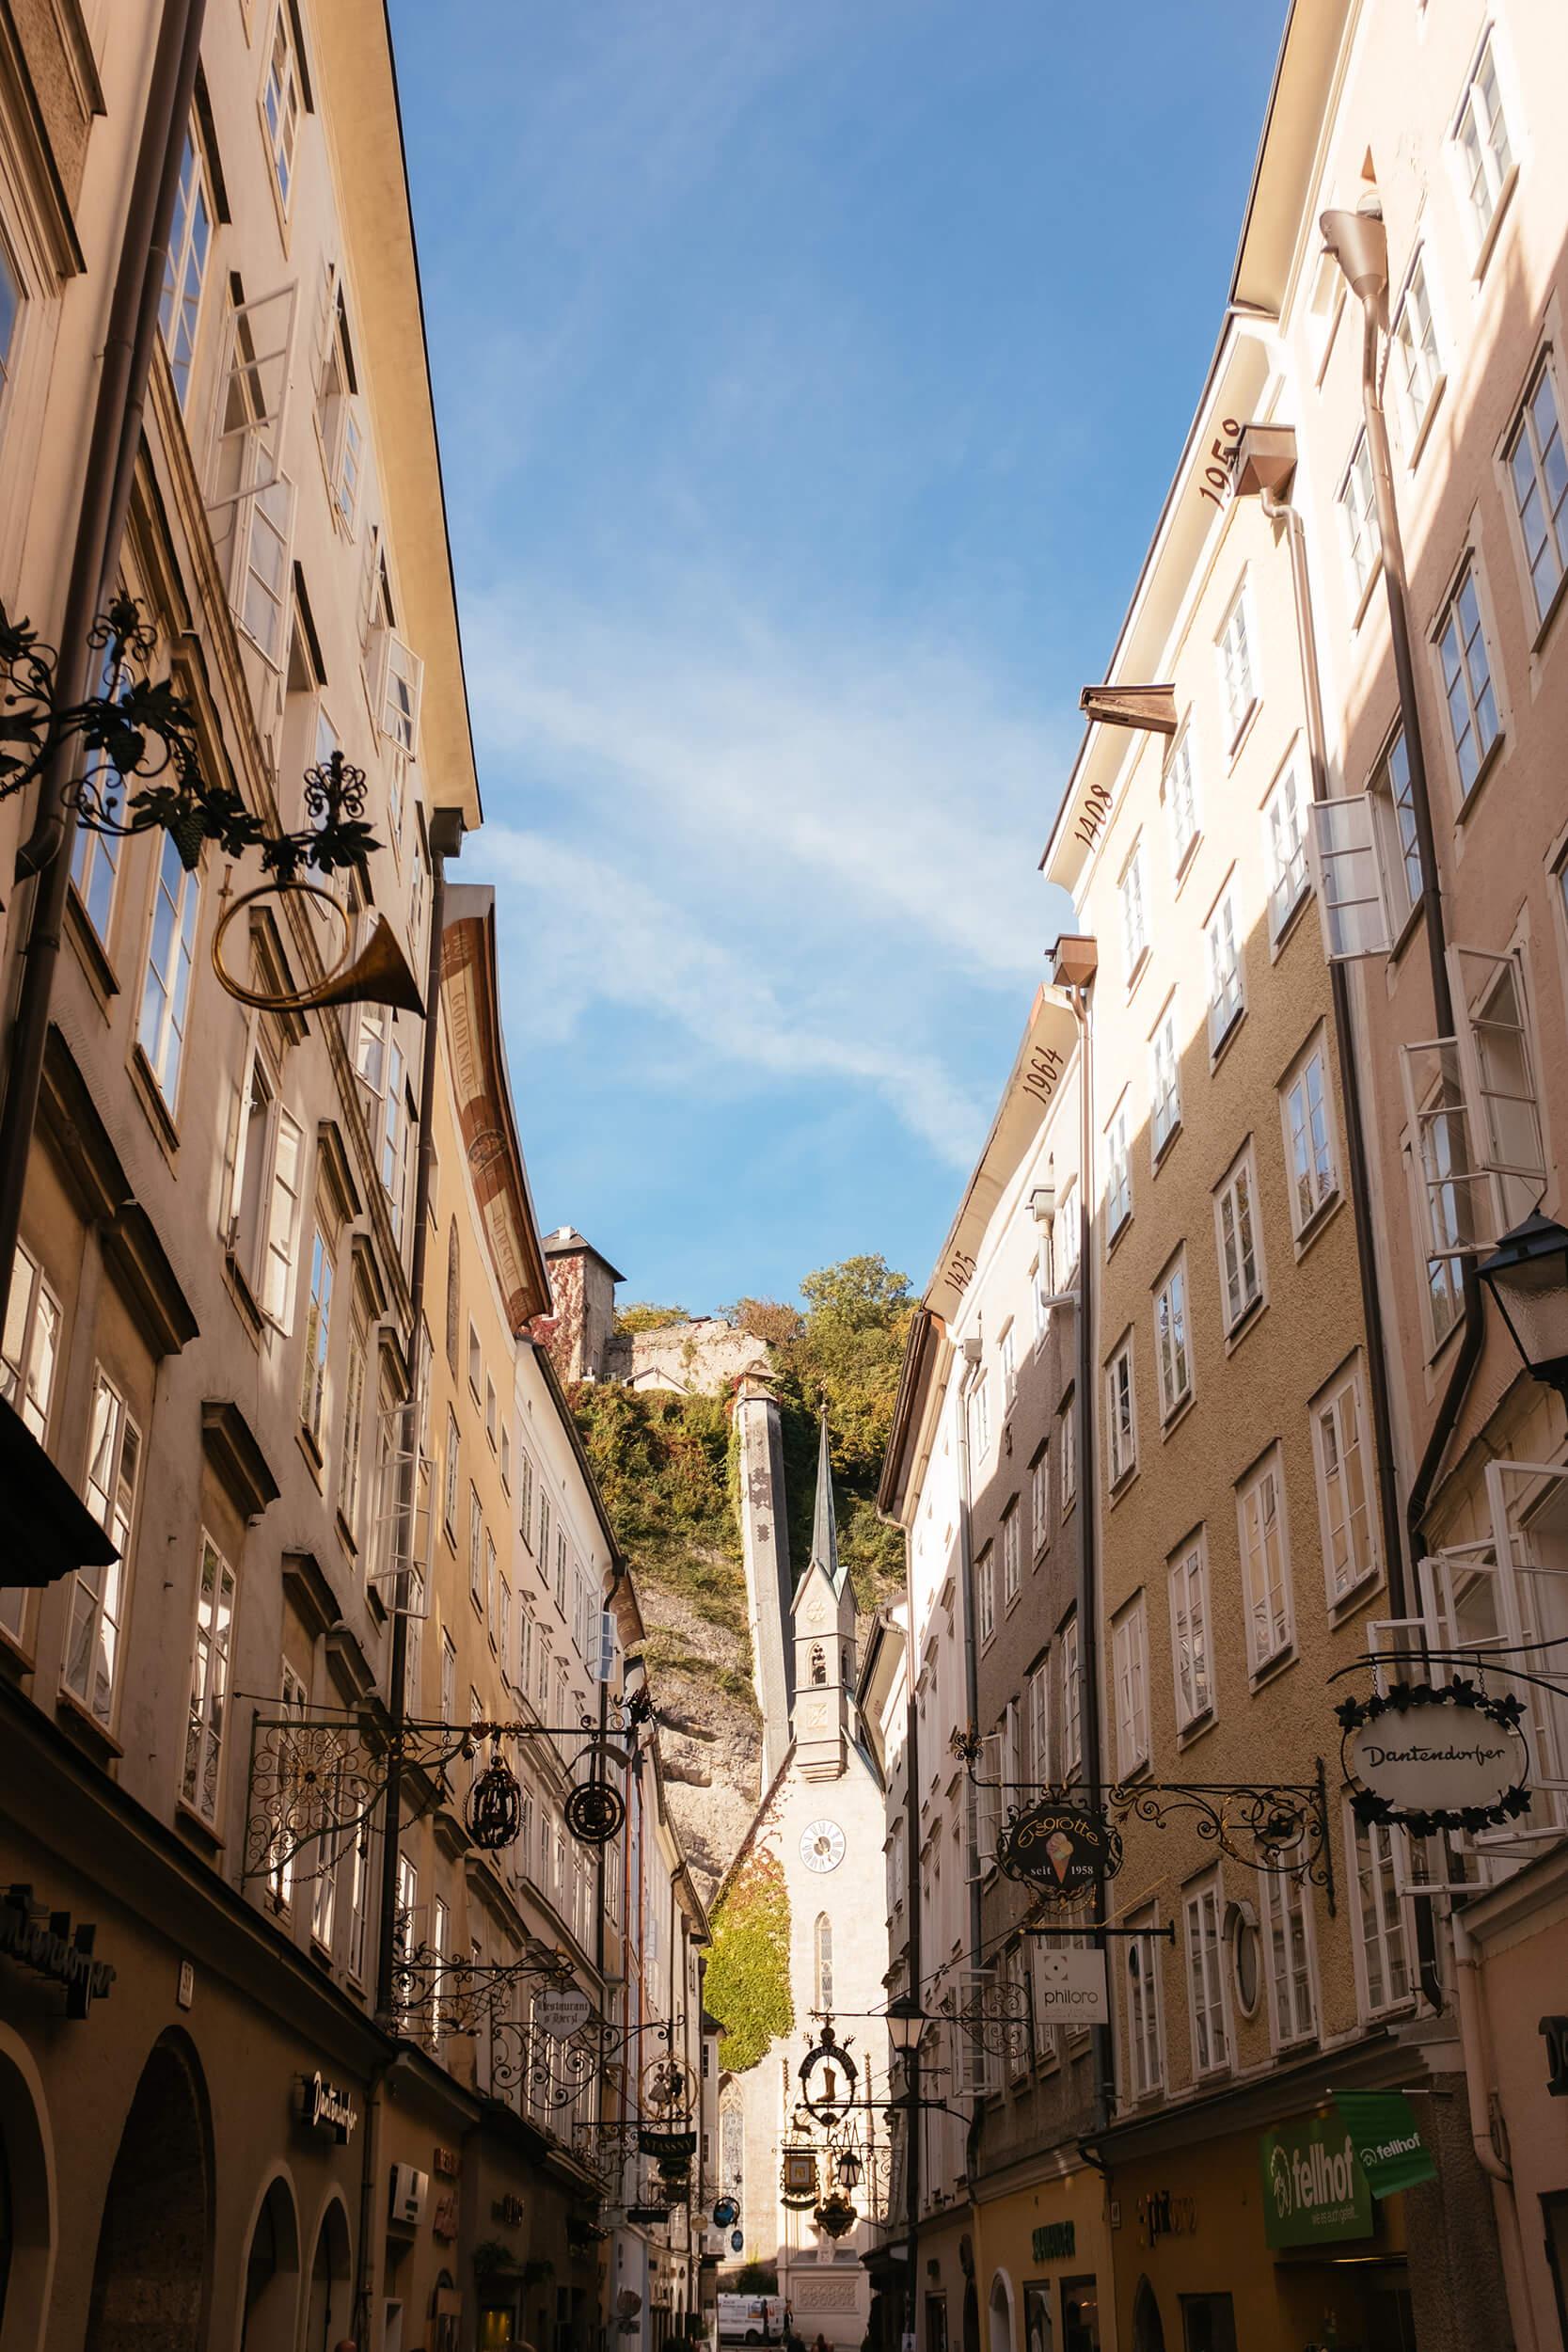 Salzburg cute old streets